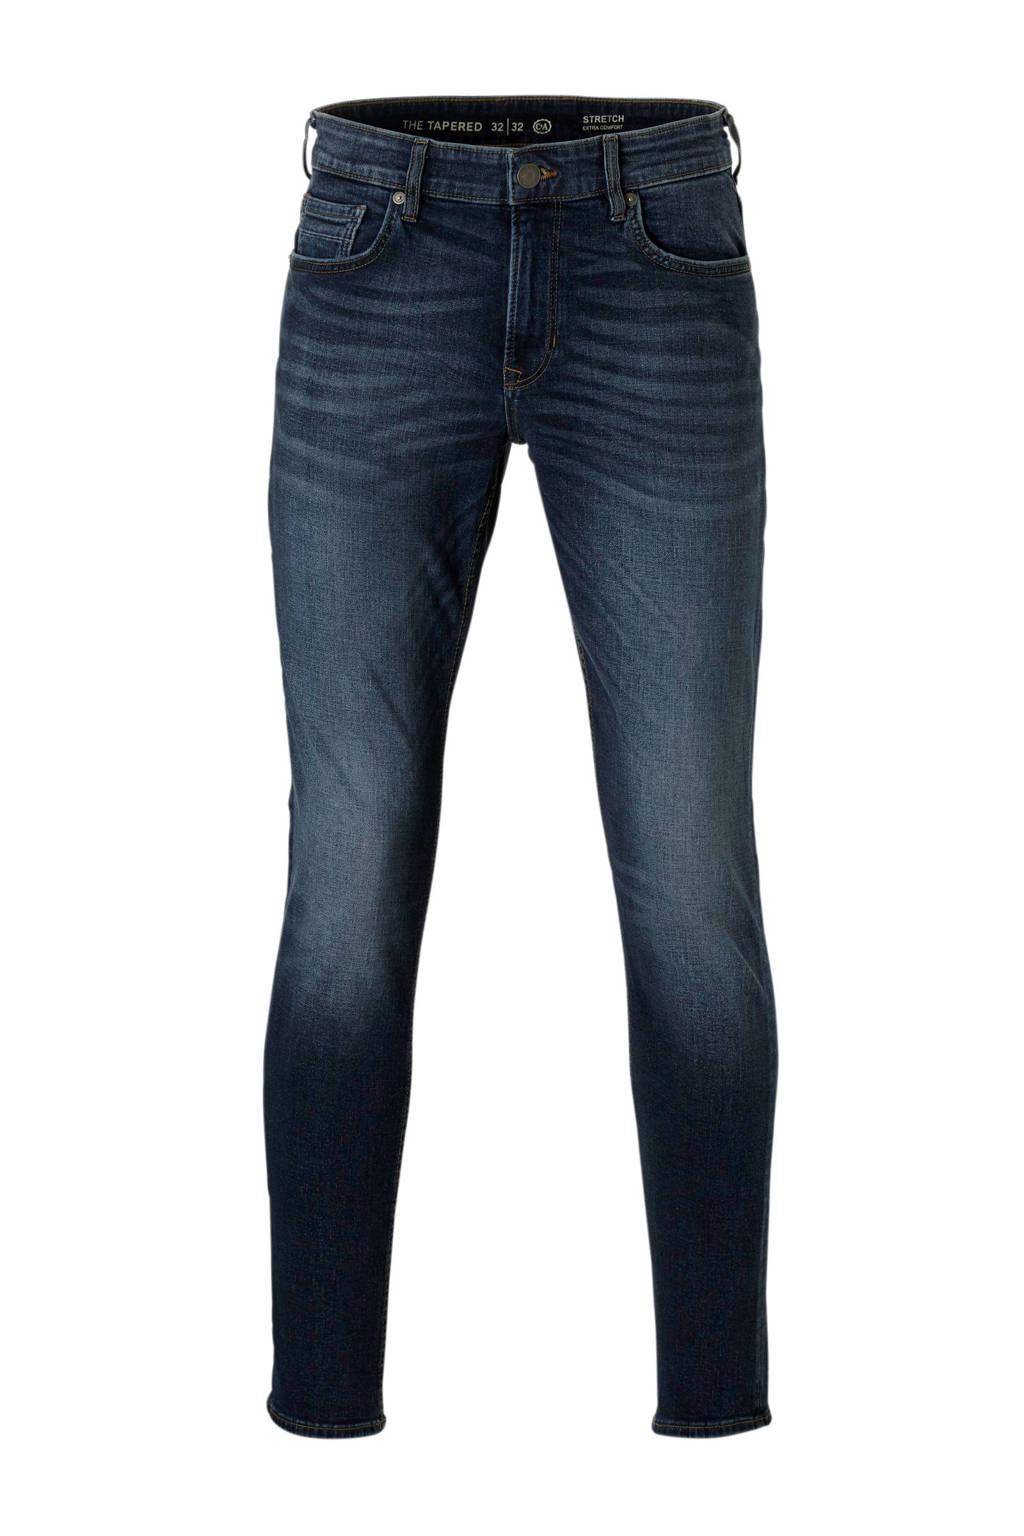 C&A The Denim  tapered tapered fit jeans, Dark denim